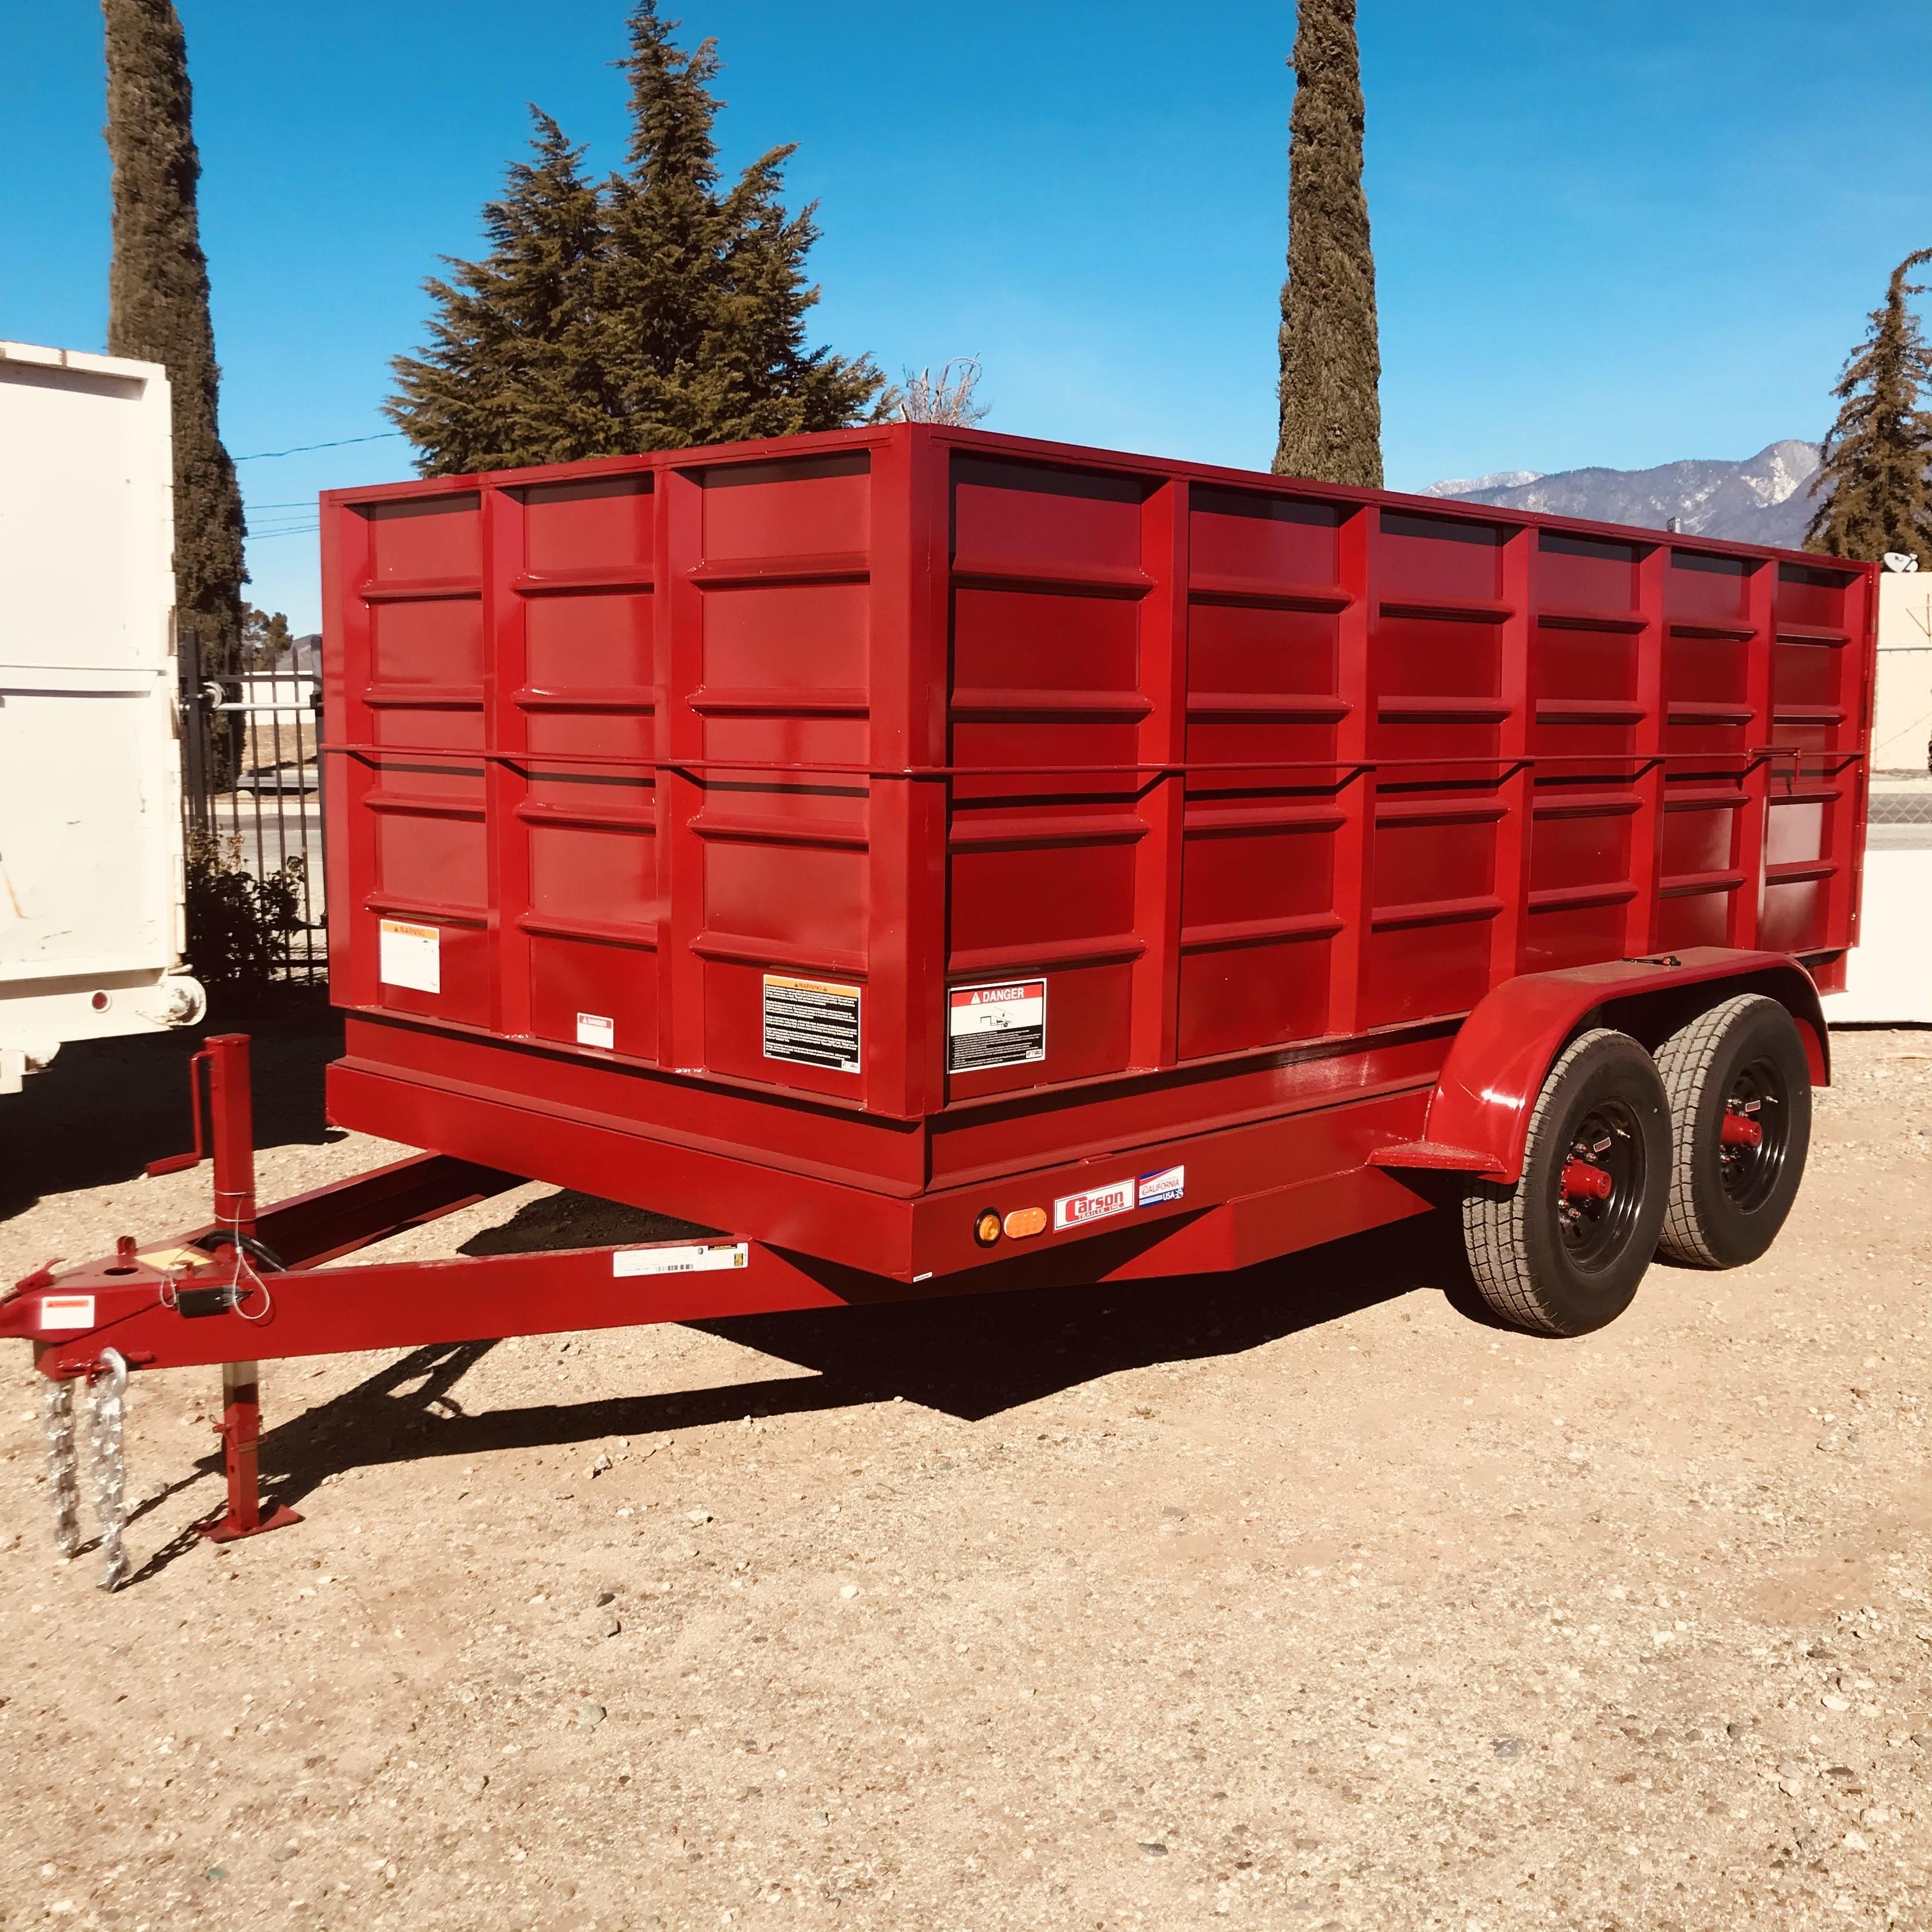 New, 2021, Carson Trailer, 7X14' Tandem Axle Dump Trailer, 10,000lb GVWR in Beaumont, Ca, Dump Trailers